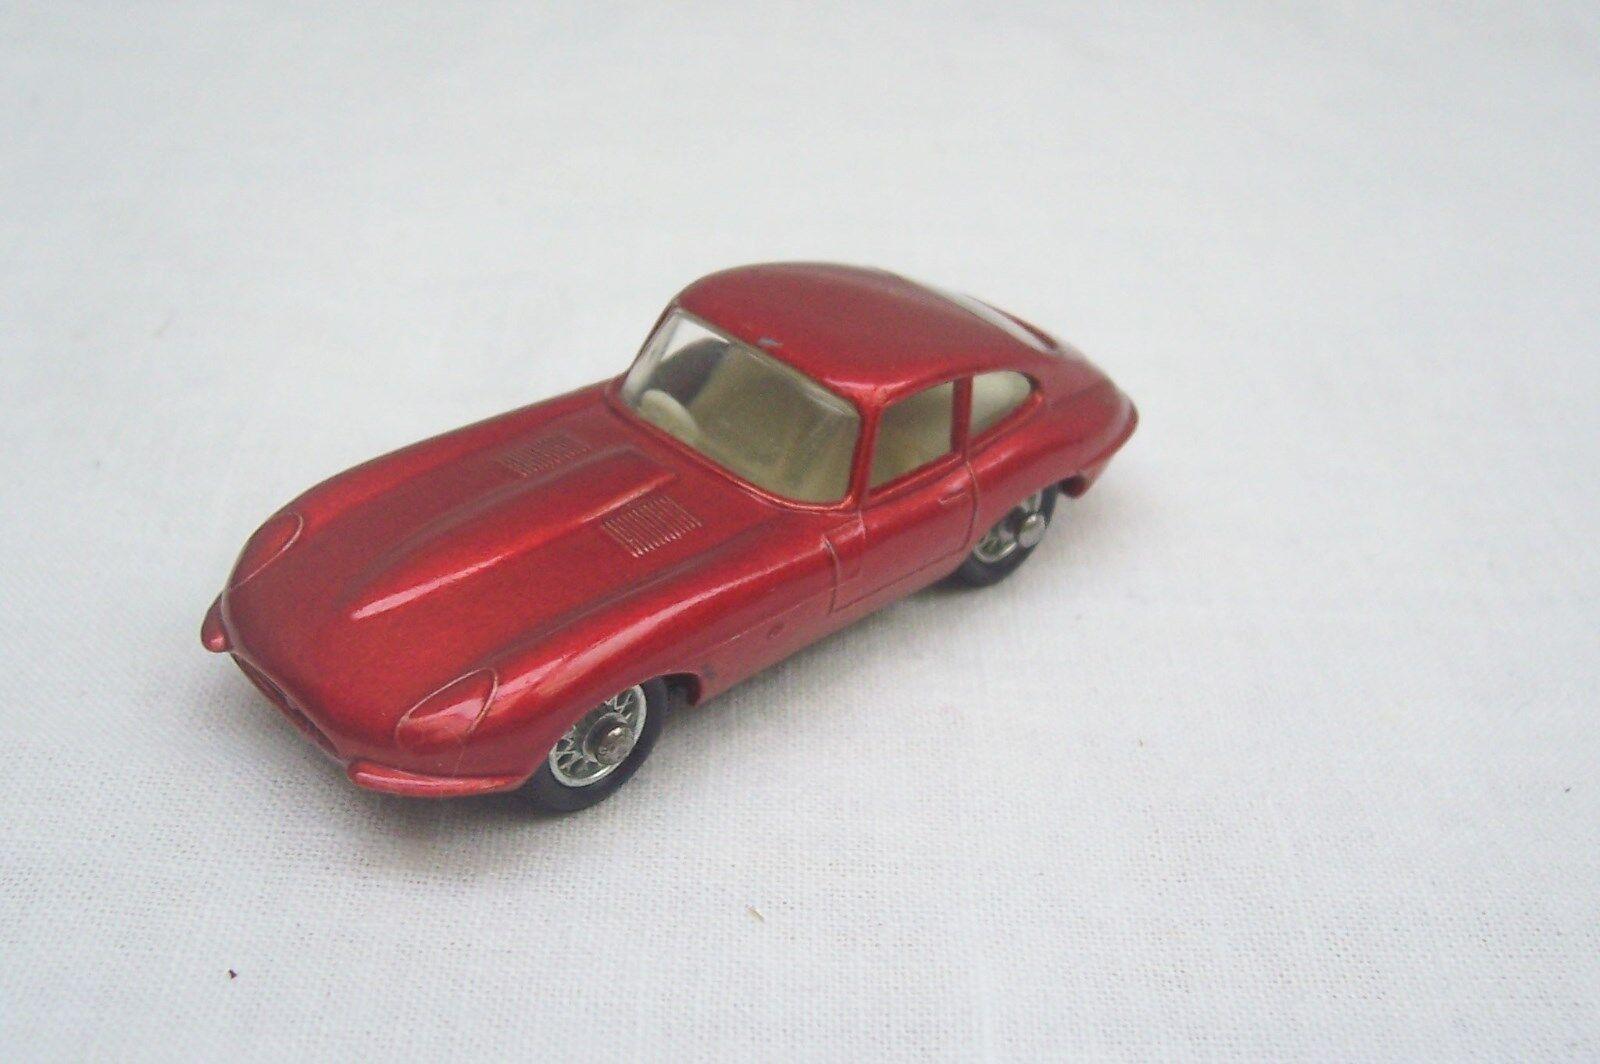 Vintage Matchbox Moko No No No 32 E Type Jaguar Car - Made In England By Lesney Lot 2 79be2b